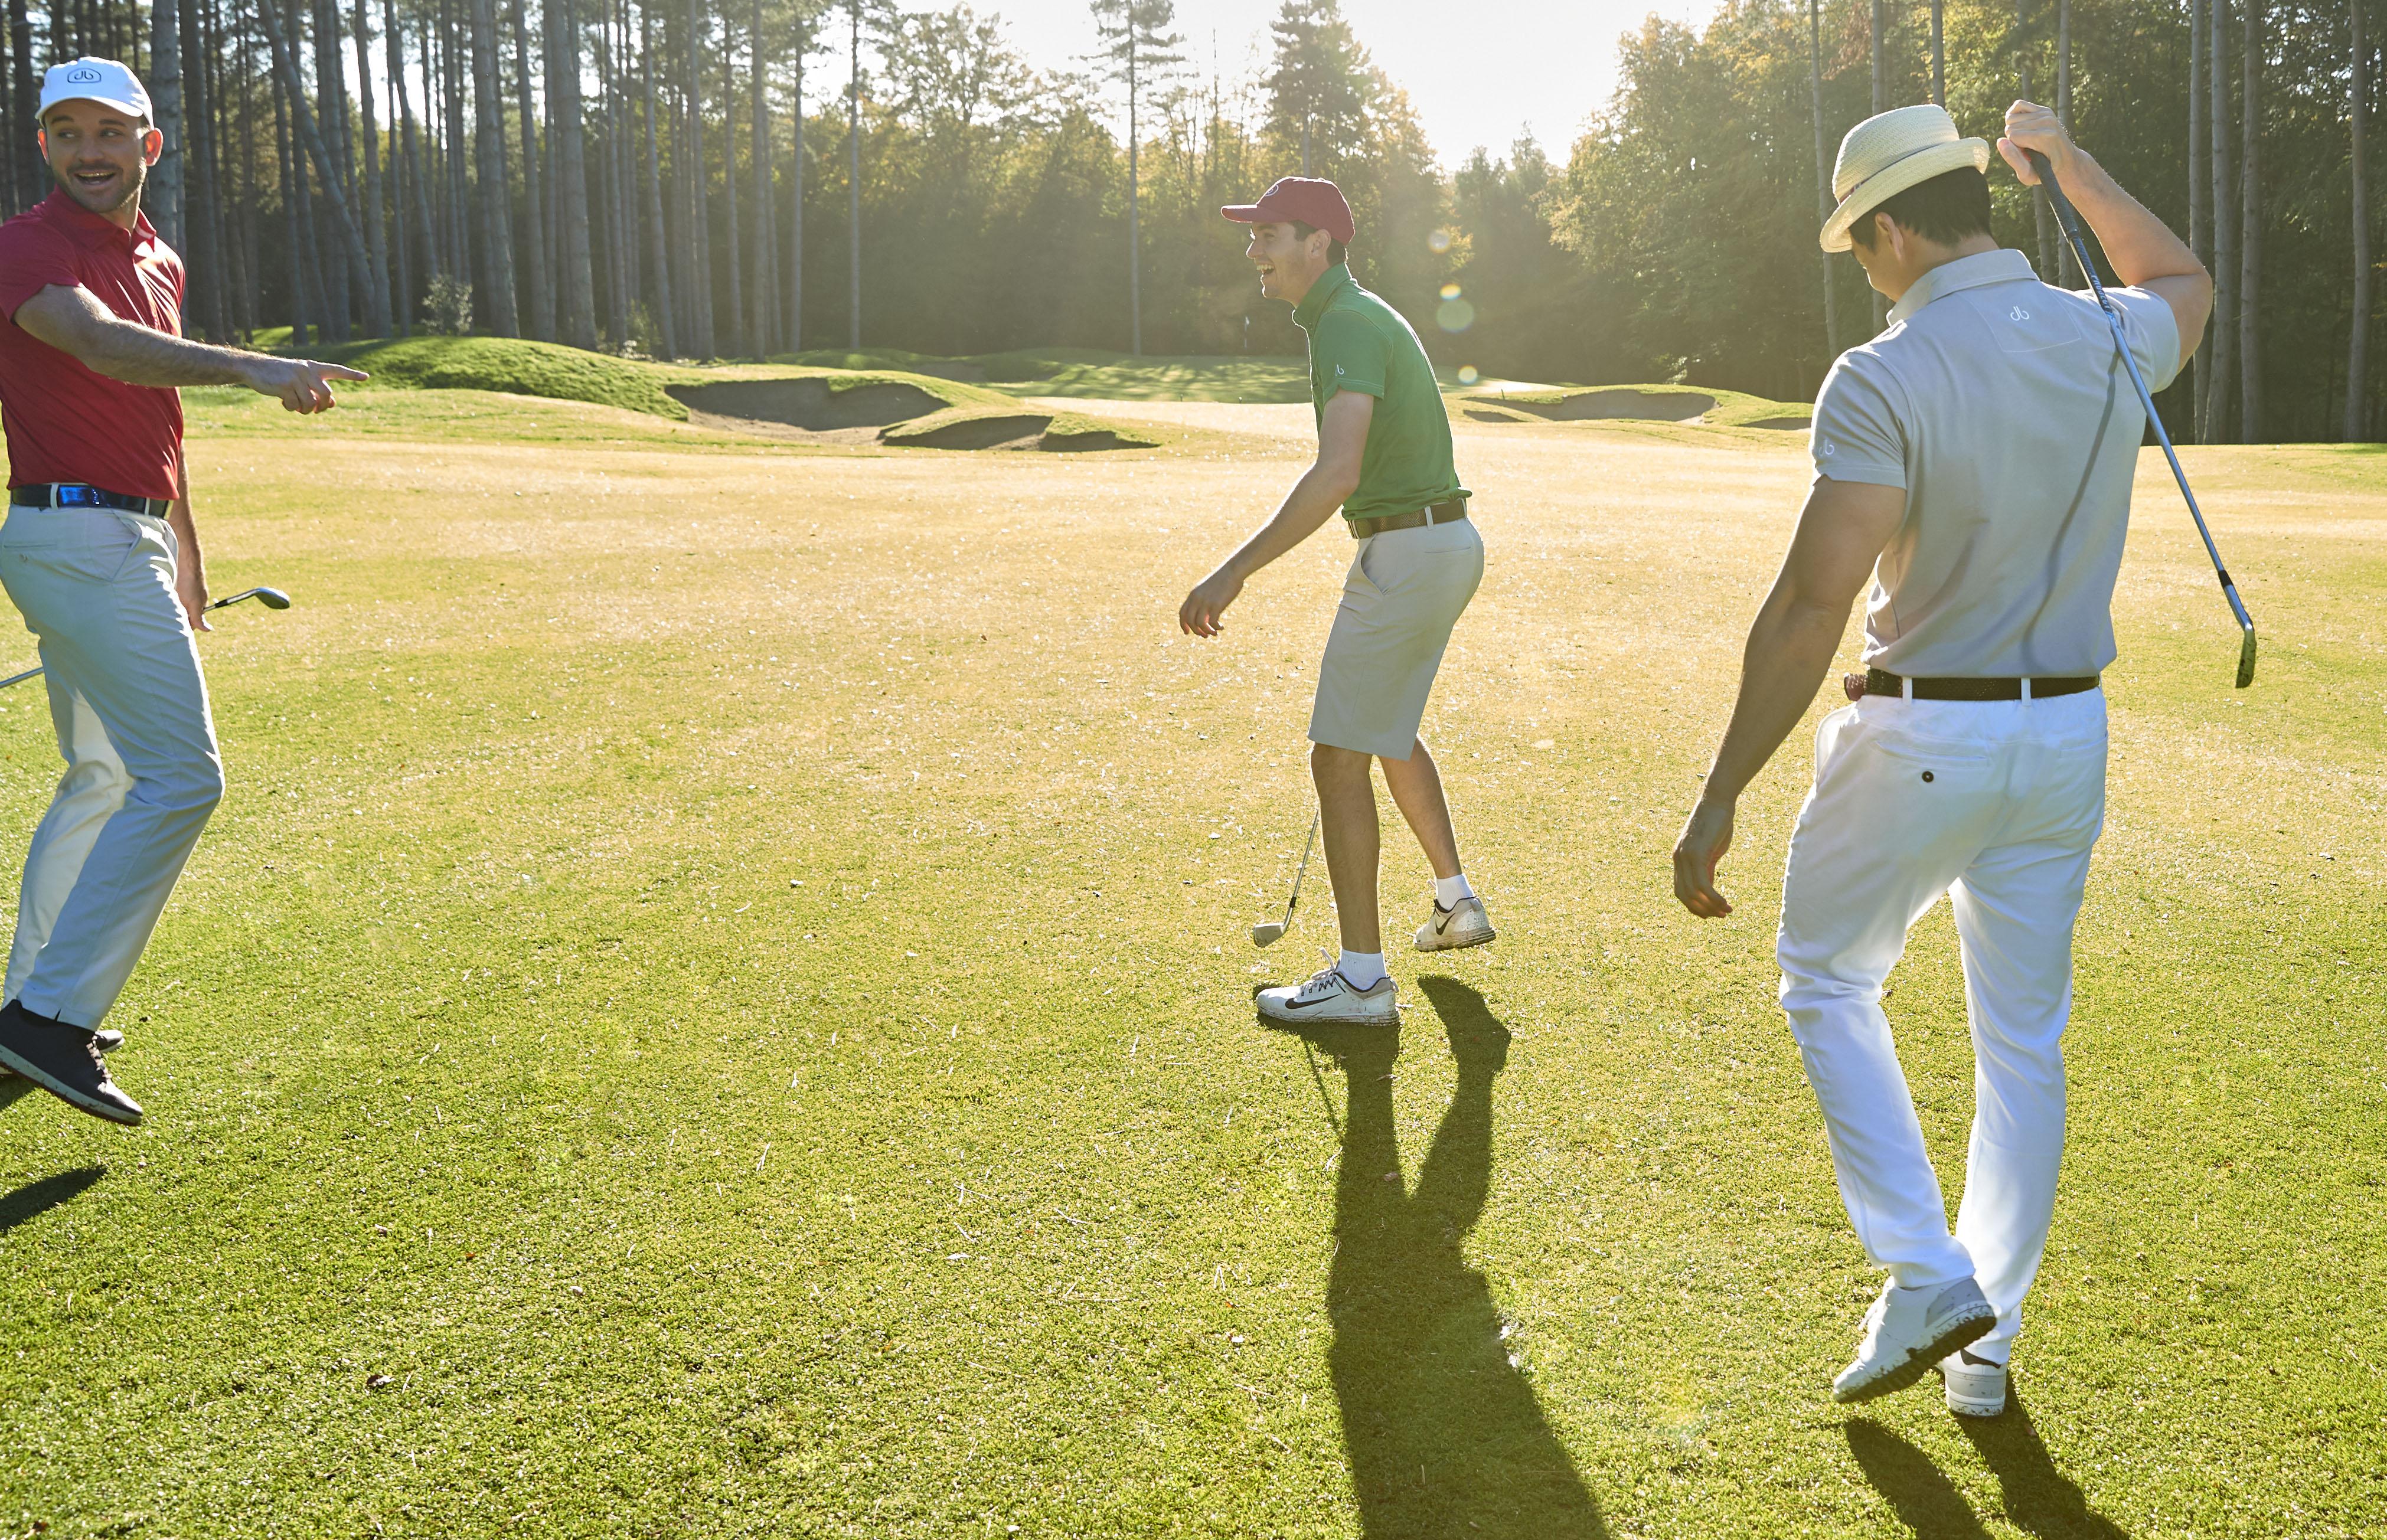 Walk the golf course